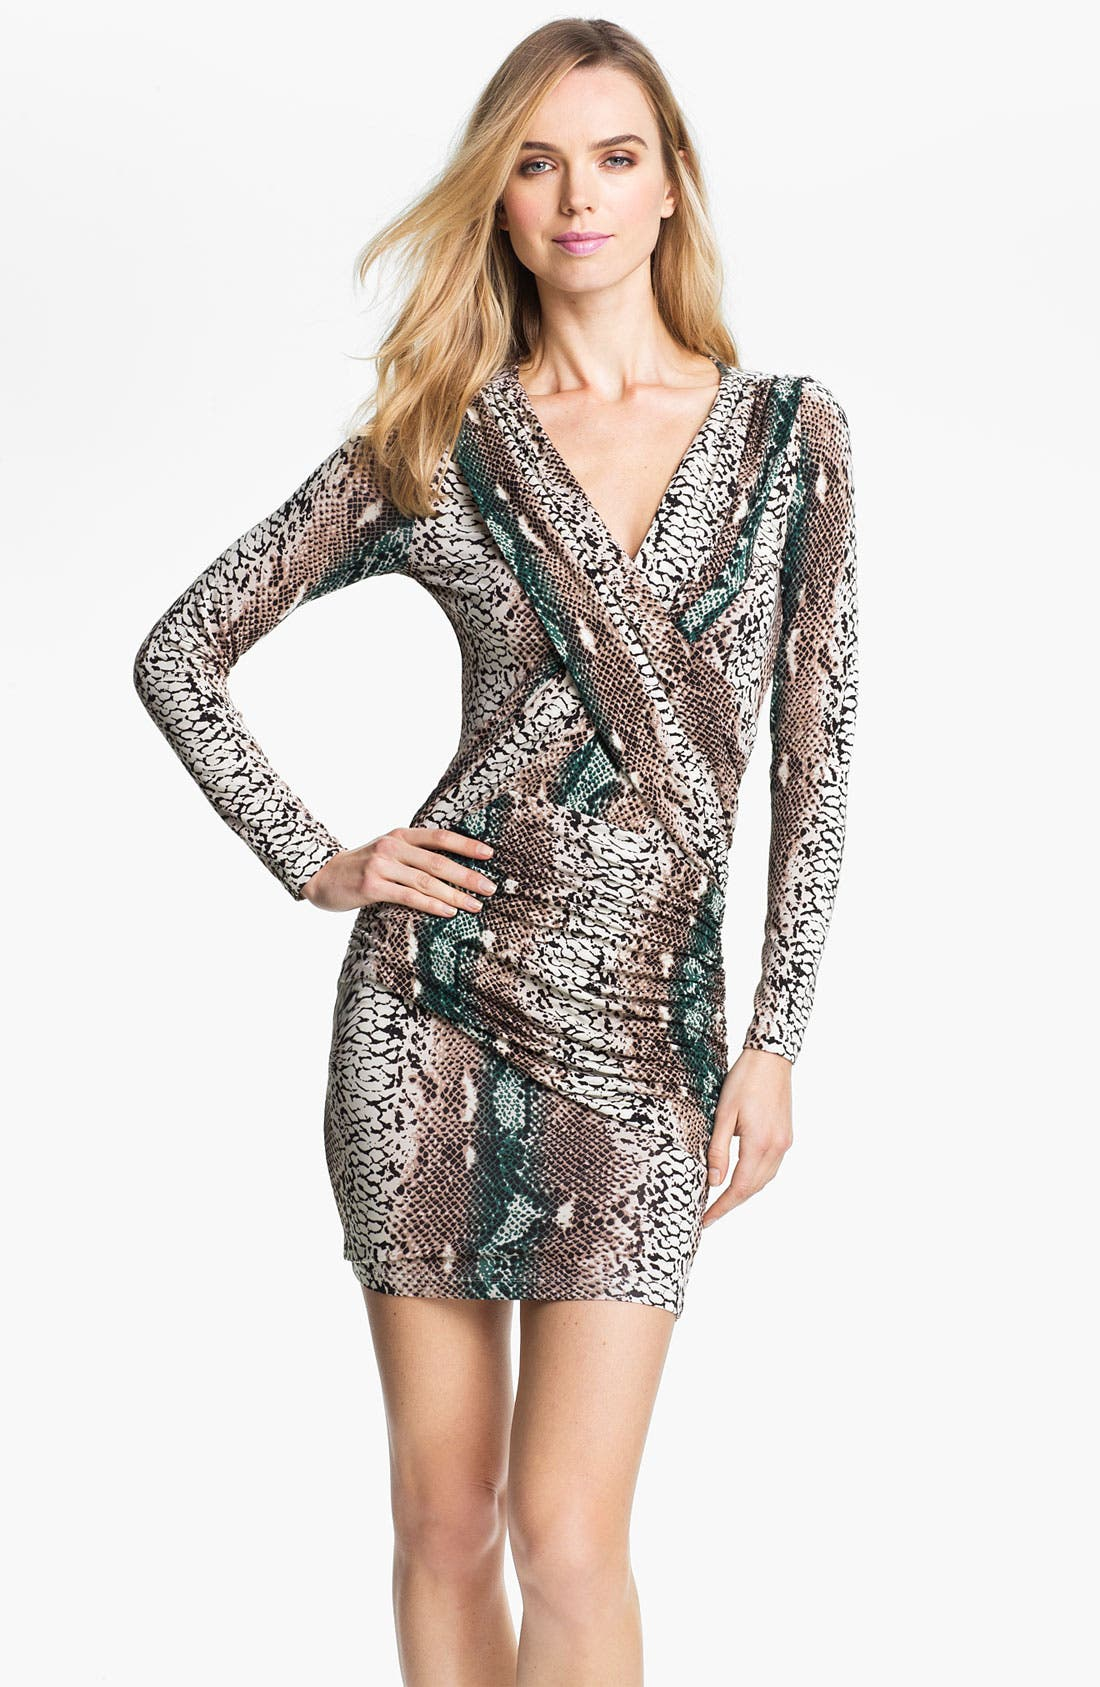 Alternate Image 1 Selected - Tart Snakeskin Print Surplice Sheath Dress